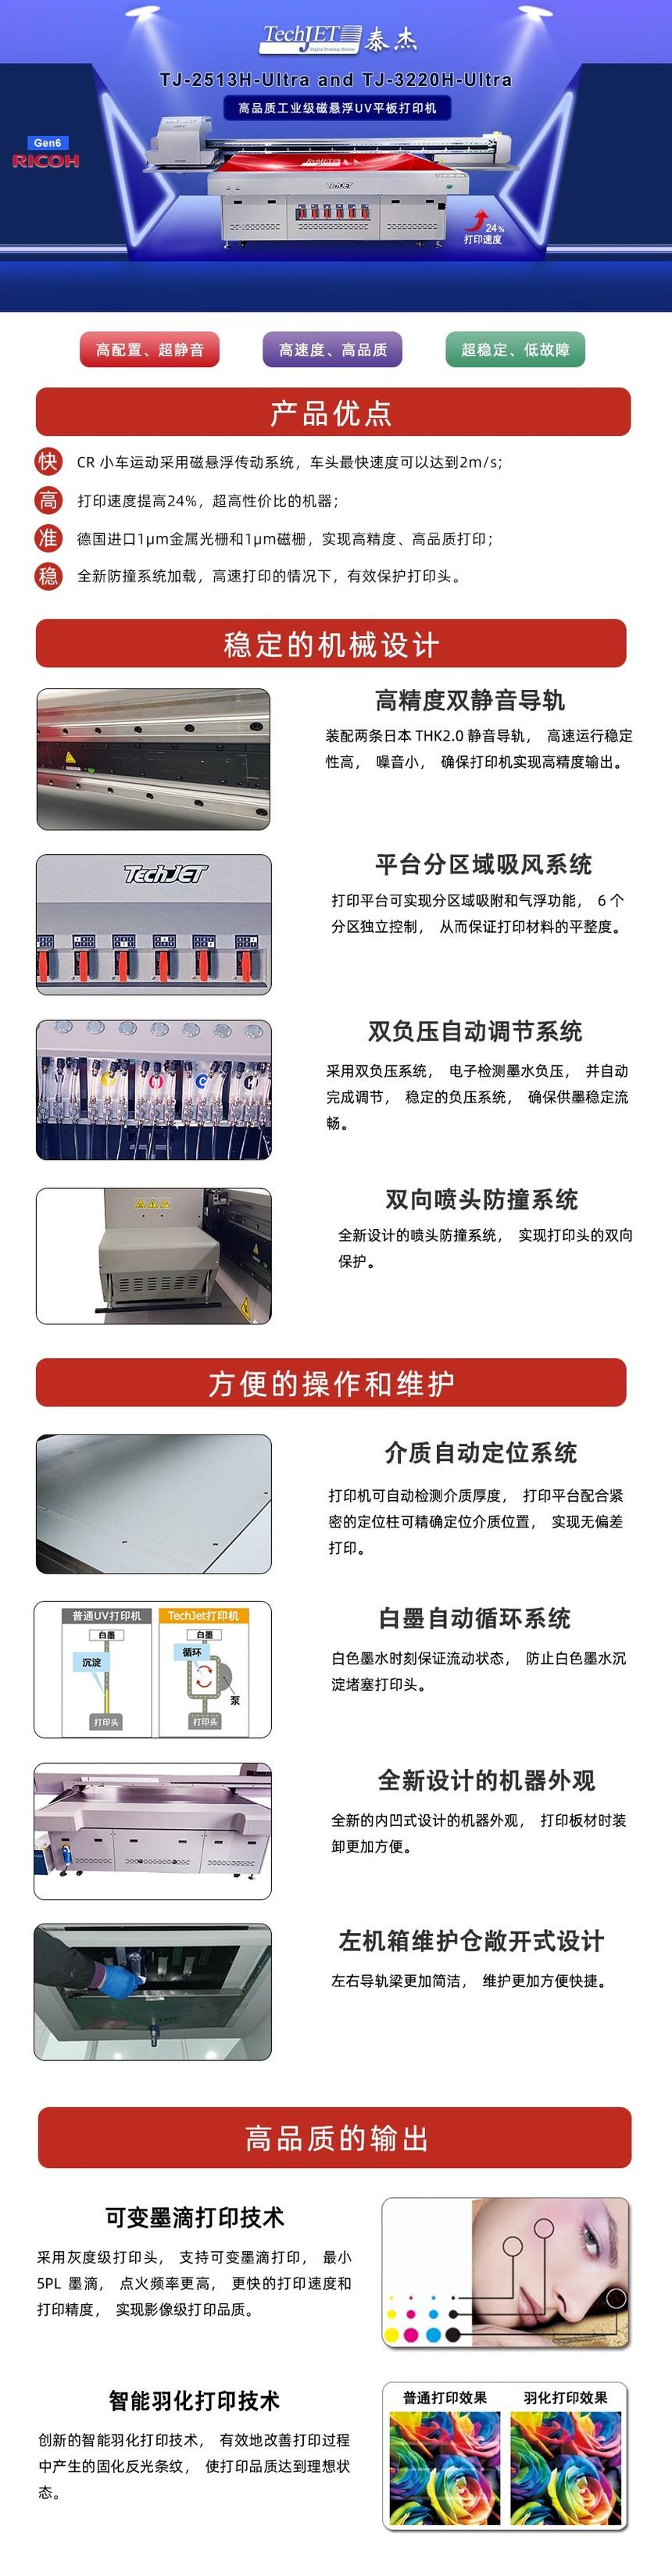 TJ-2513H-Ultra中文产品说明(1).jpg